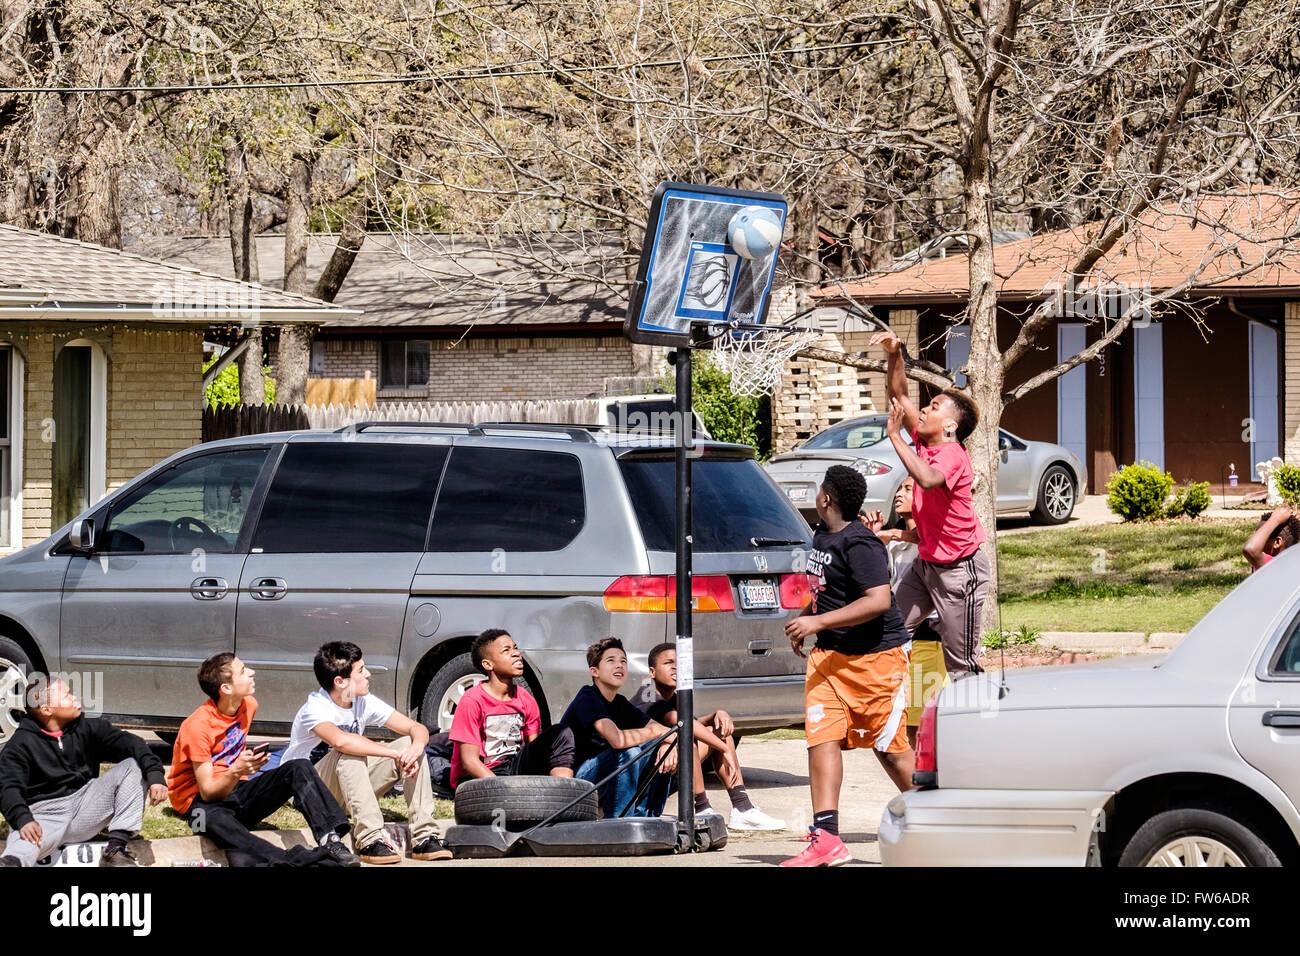 Teen and pre-teen boys gather and play basketball on the street in Oklahoma City, Oklahoma, USA. - Stock Image